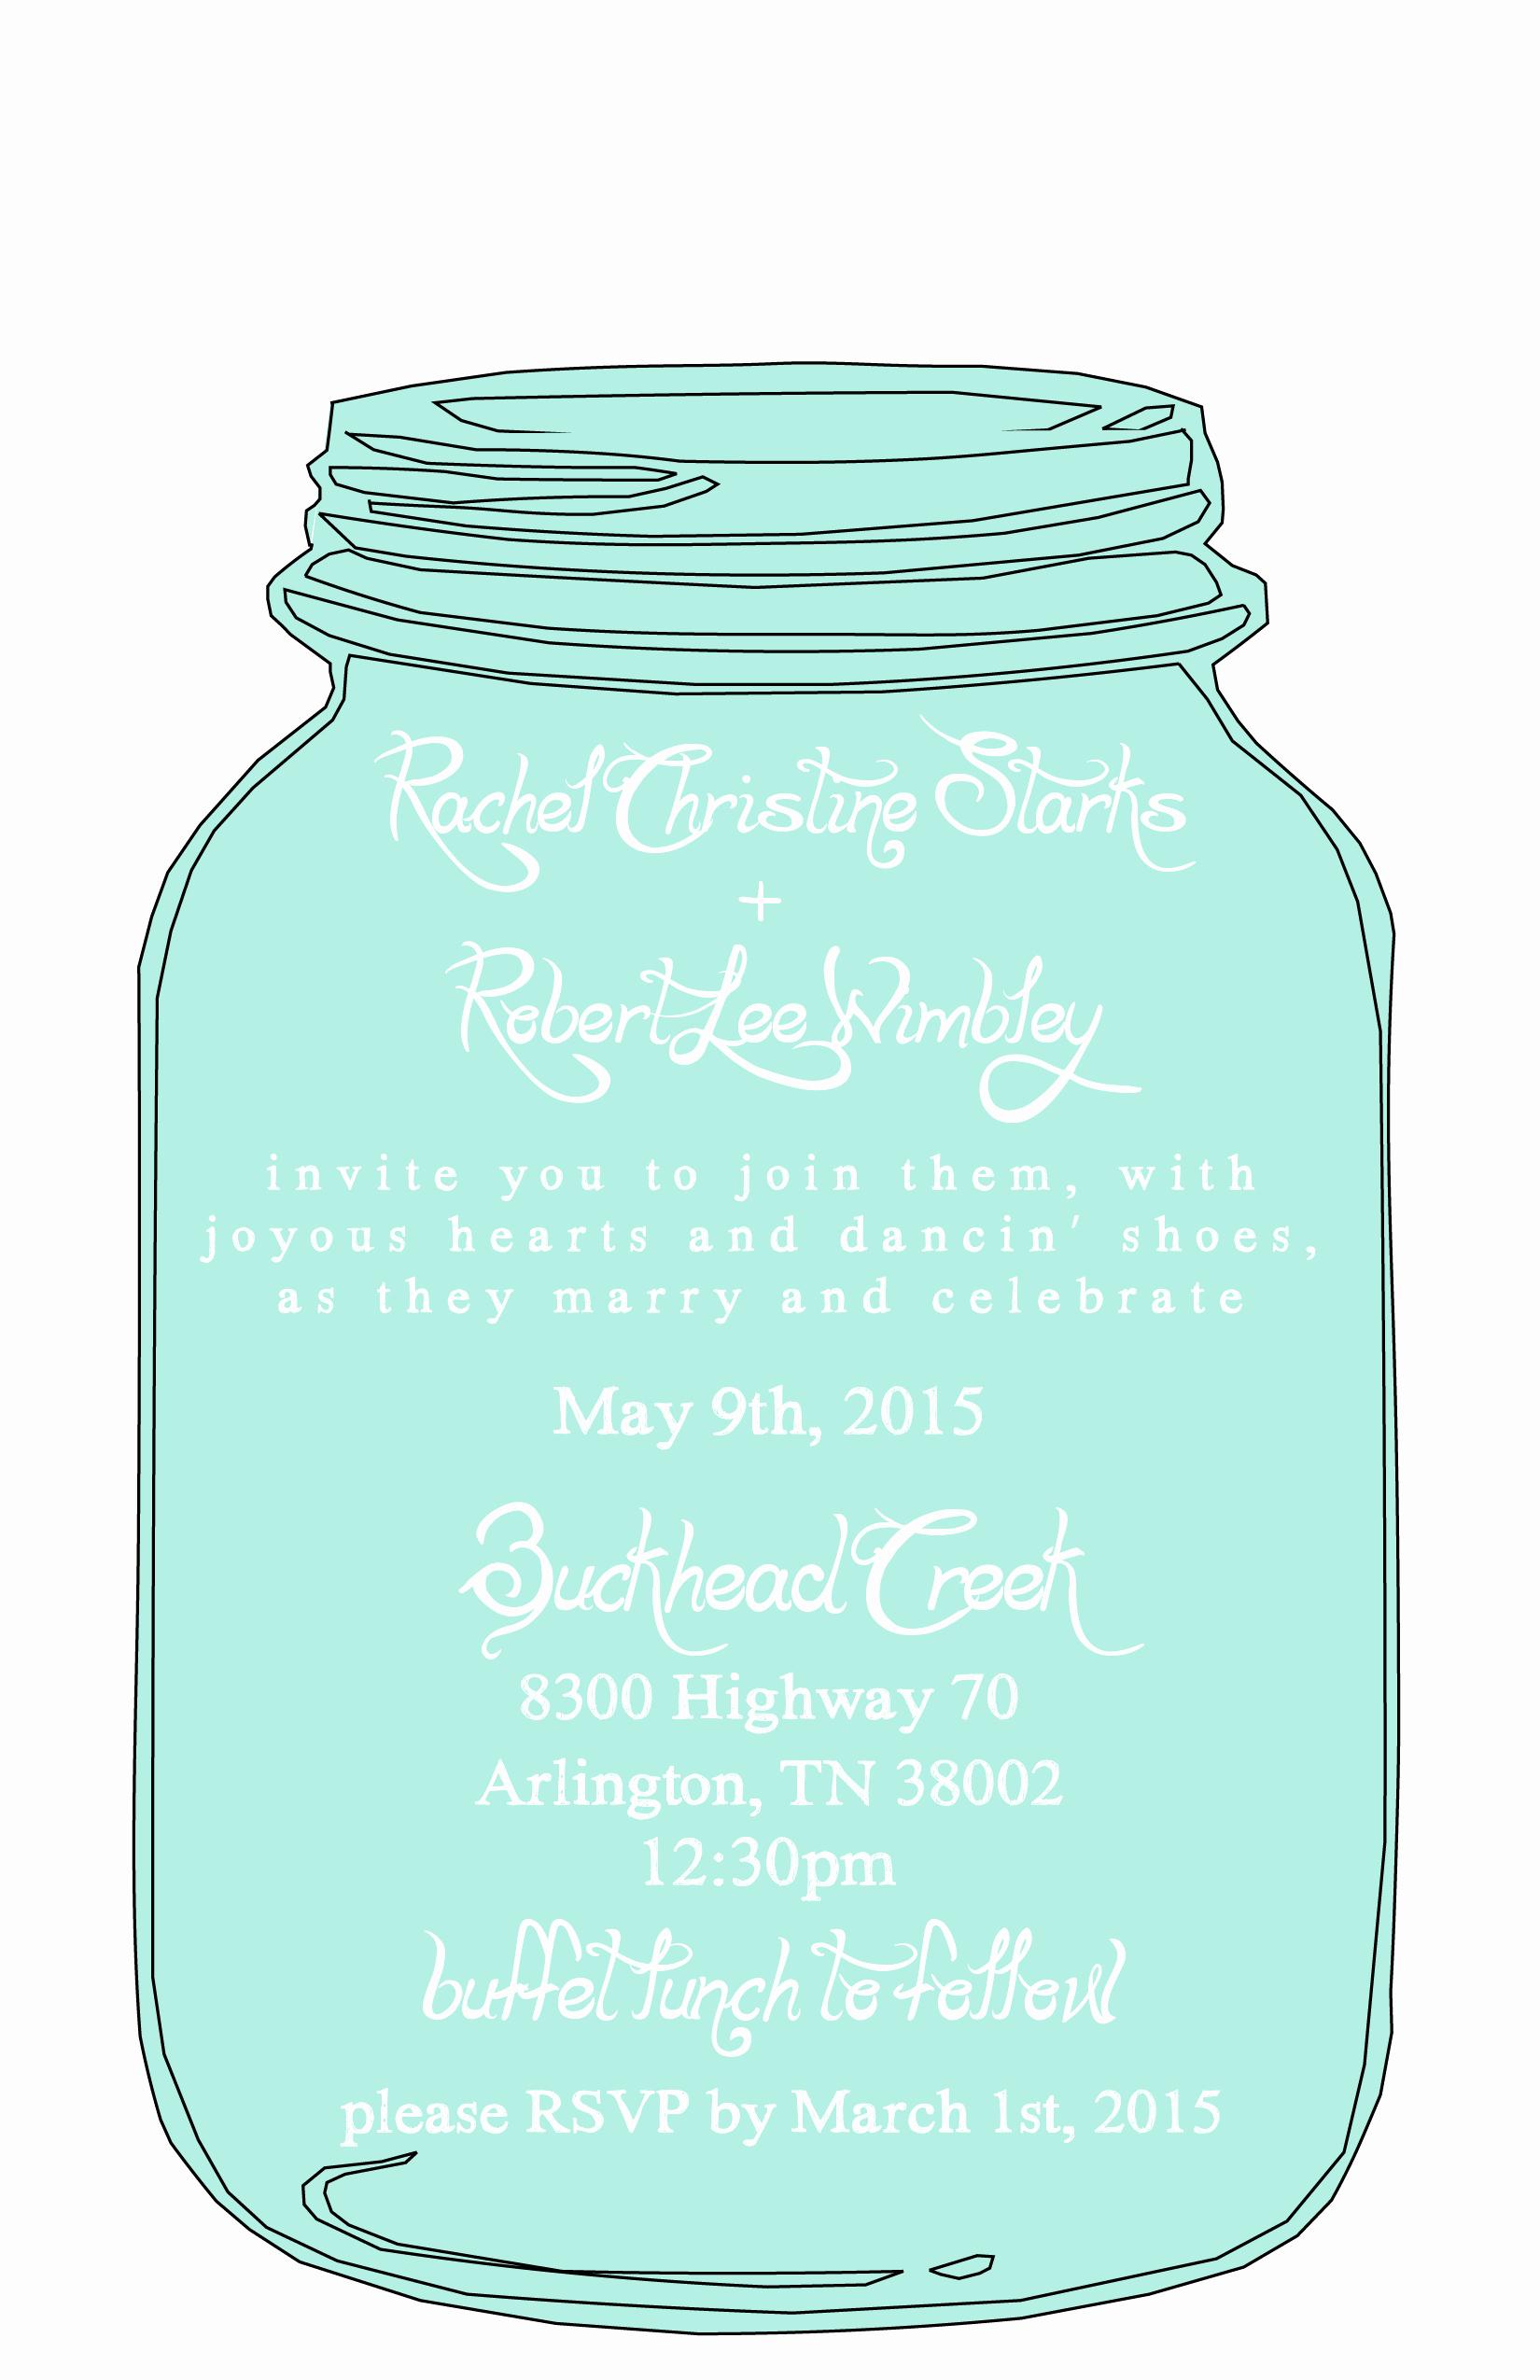 Free Bridal Shower Invitation Templates Elegant Floral Wreath Free Printable Bridal Shower Invitation